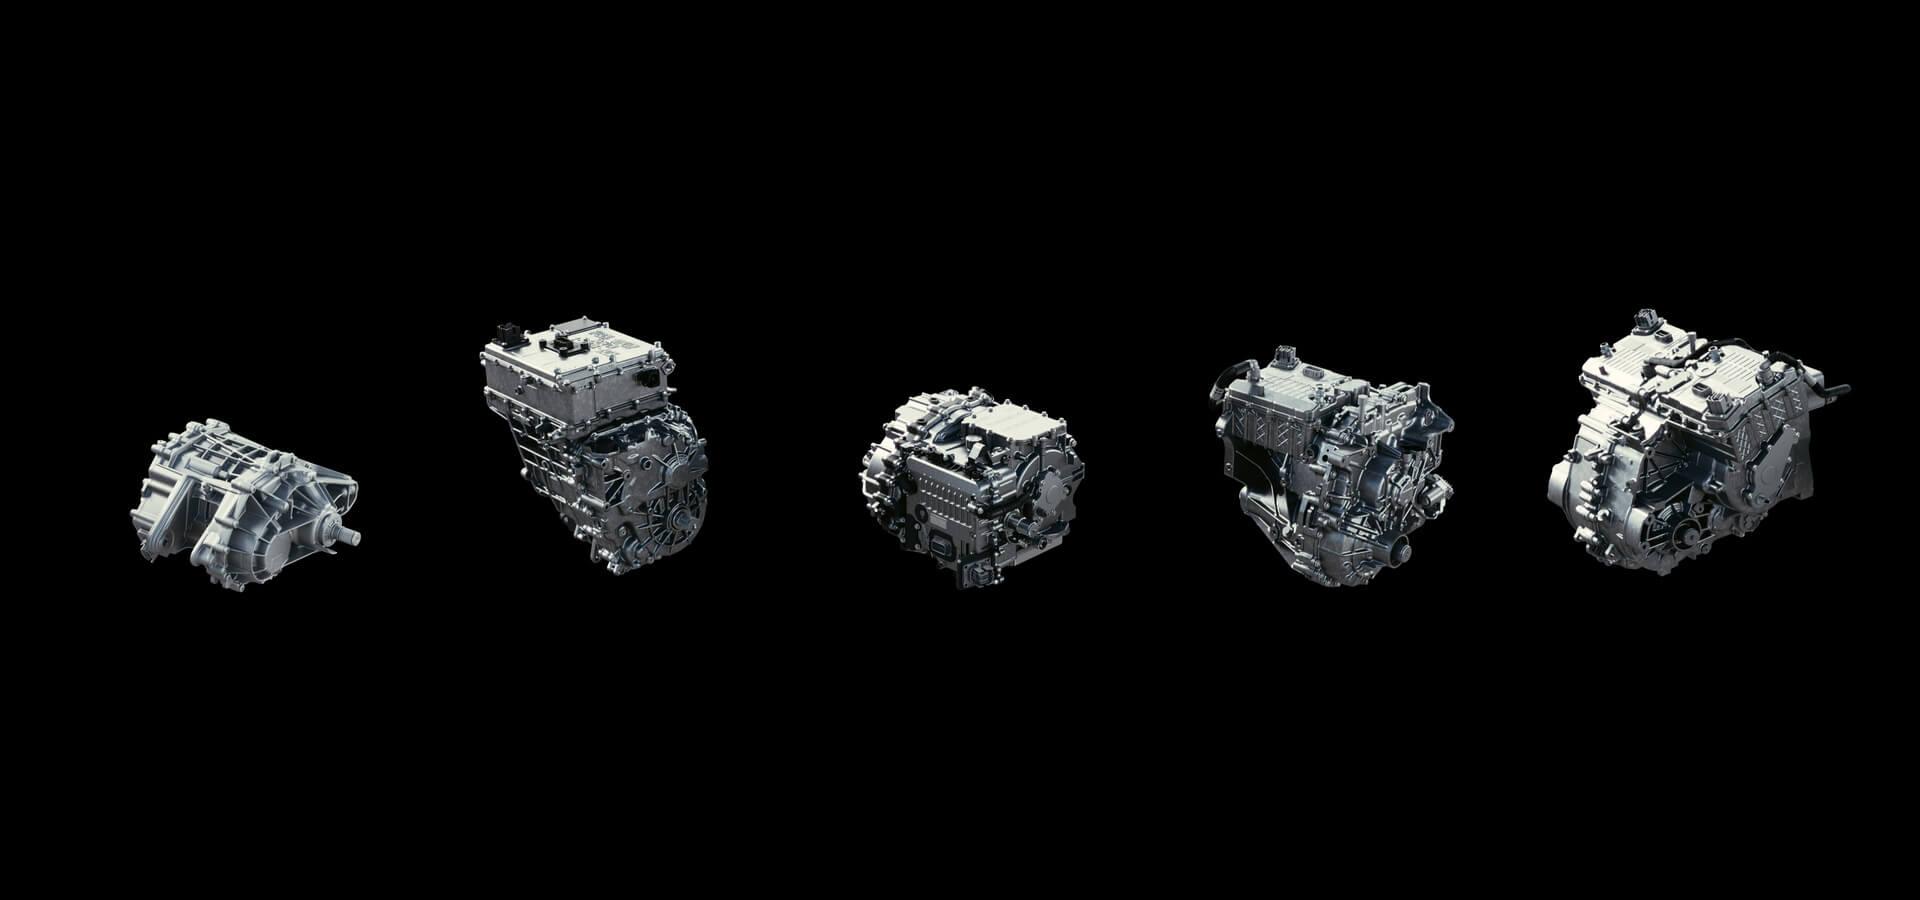 General Motors представила свою линейку электроприводов под названием Ultium Drive